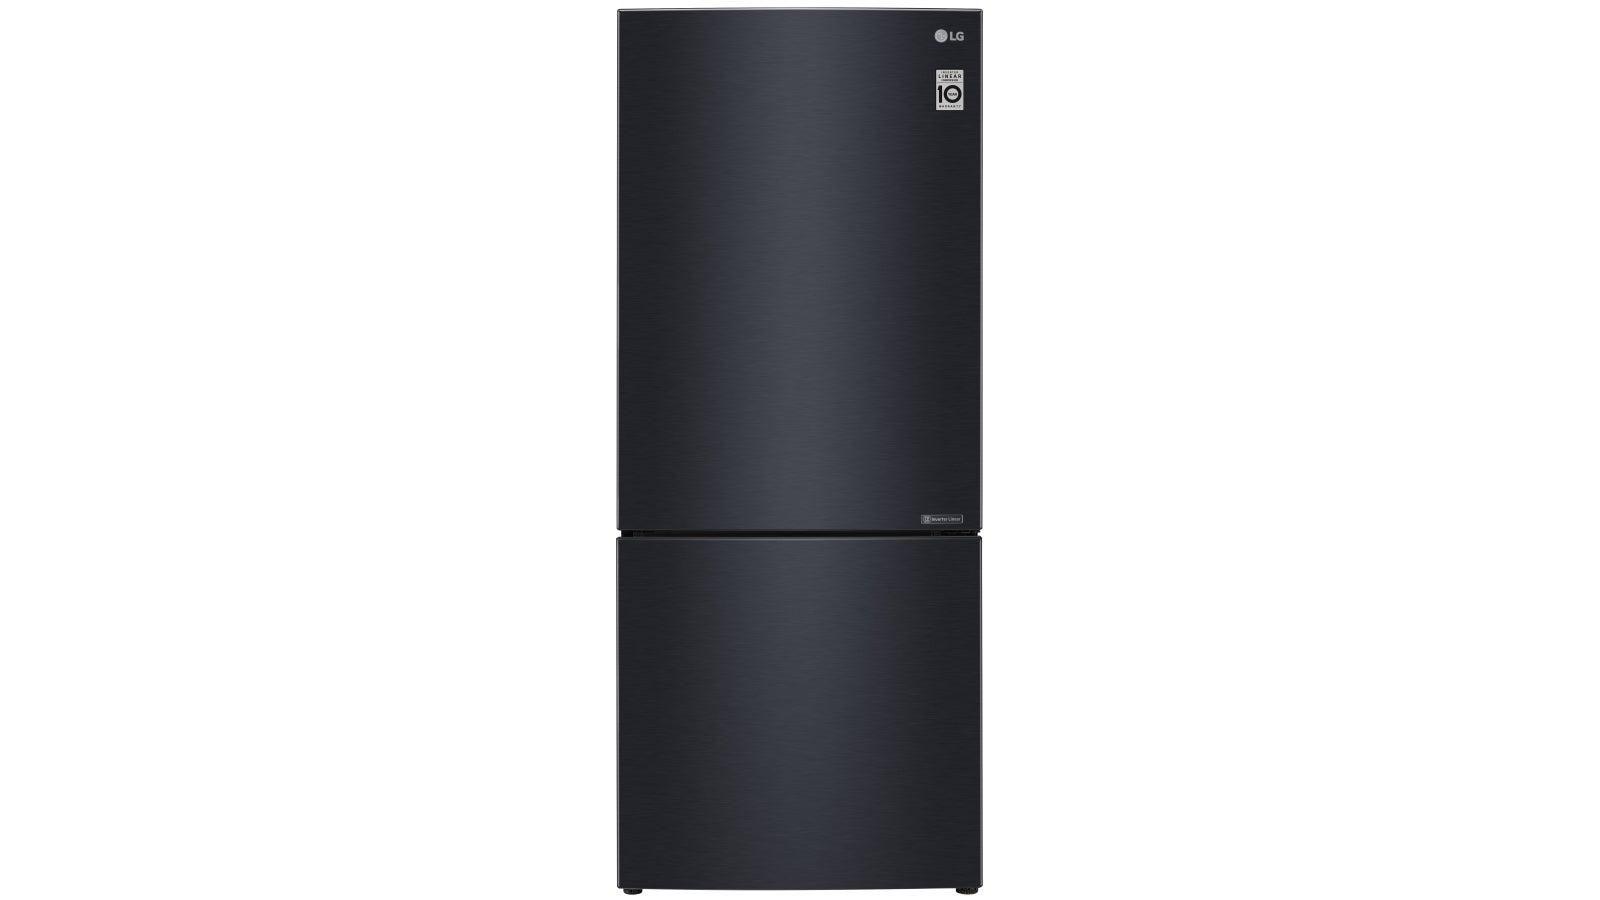 LG GB450UMBLX Refrigerator